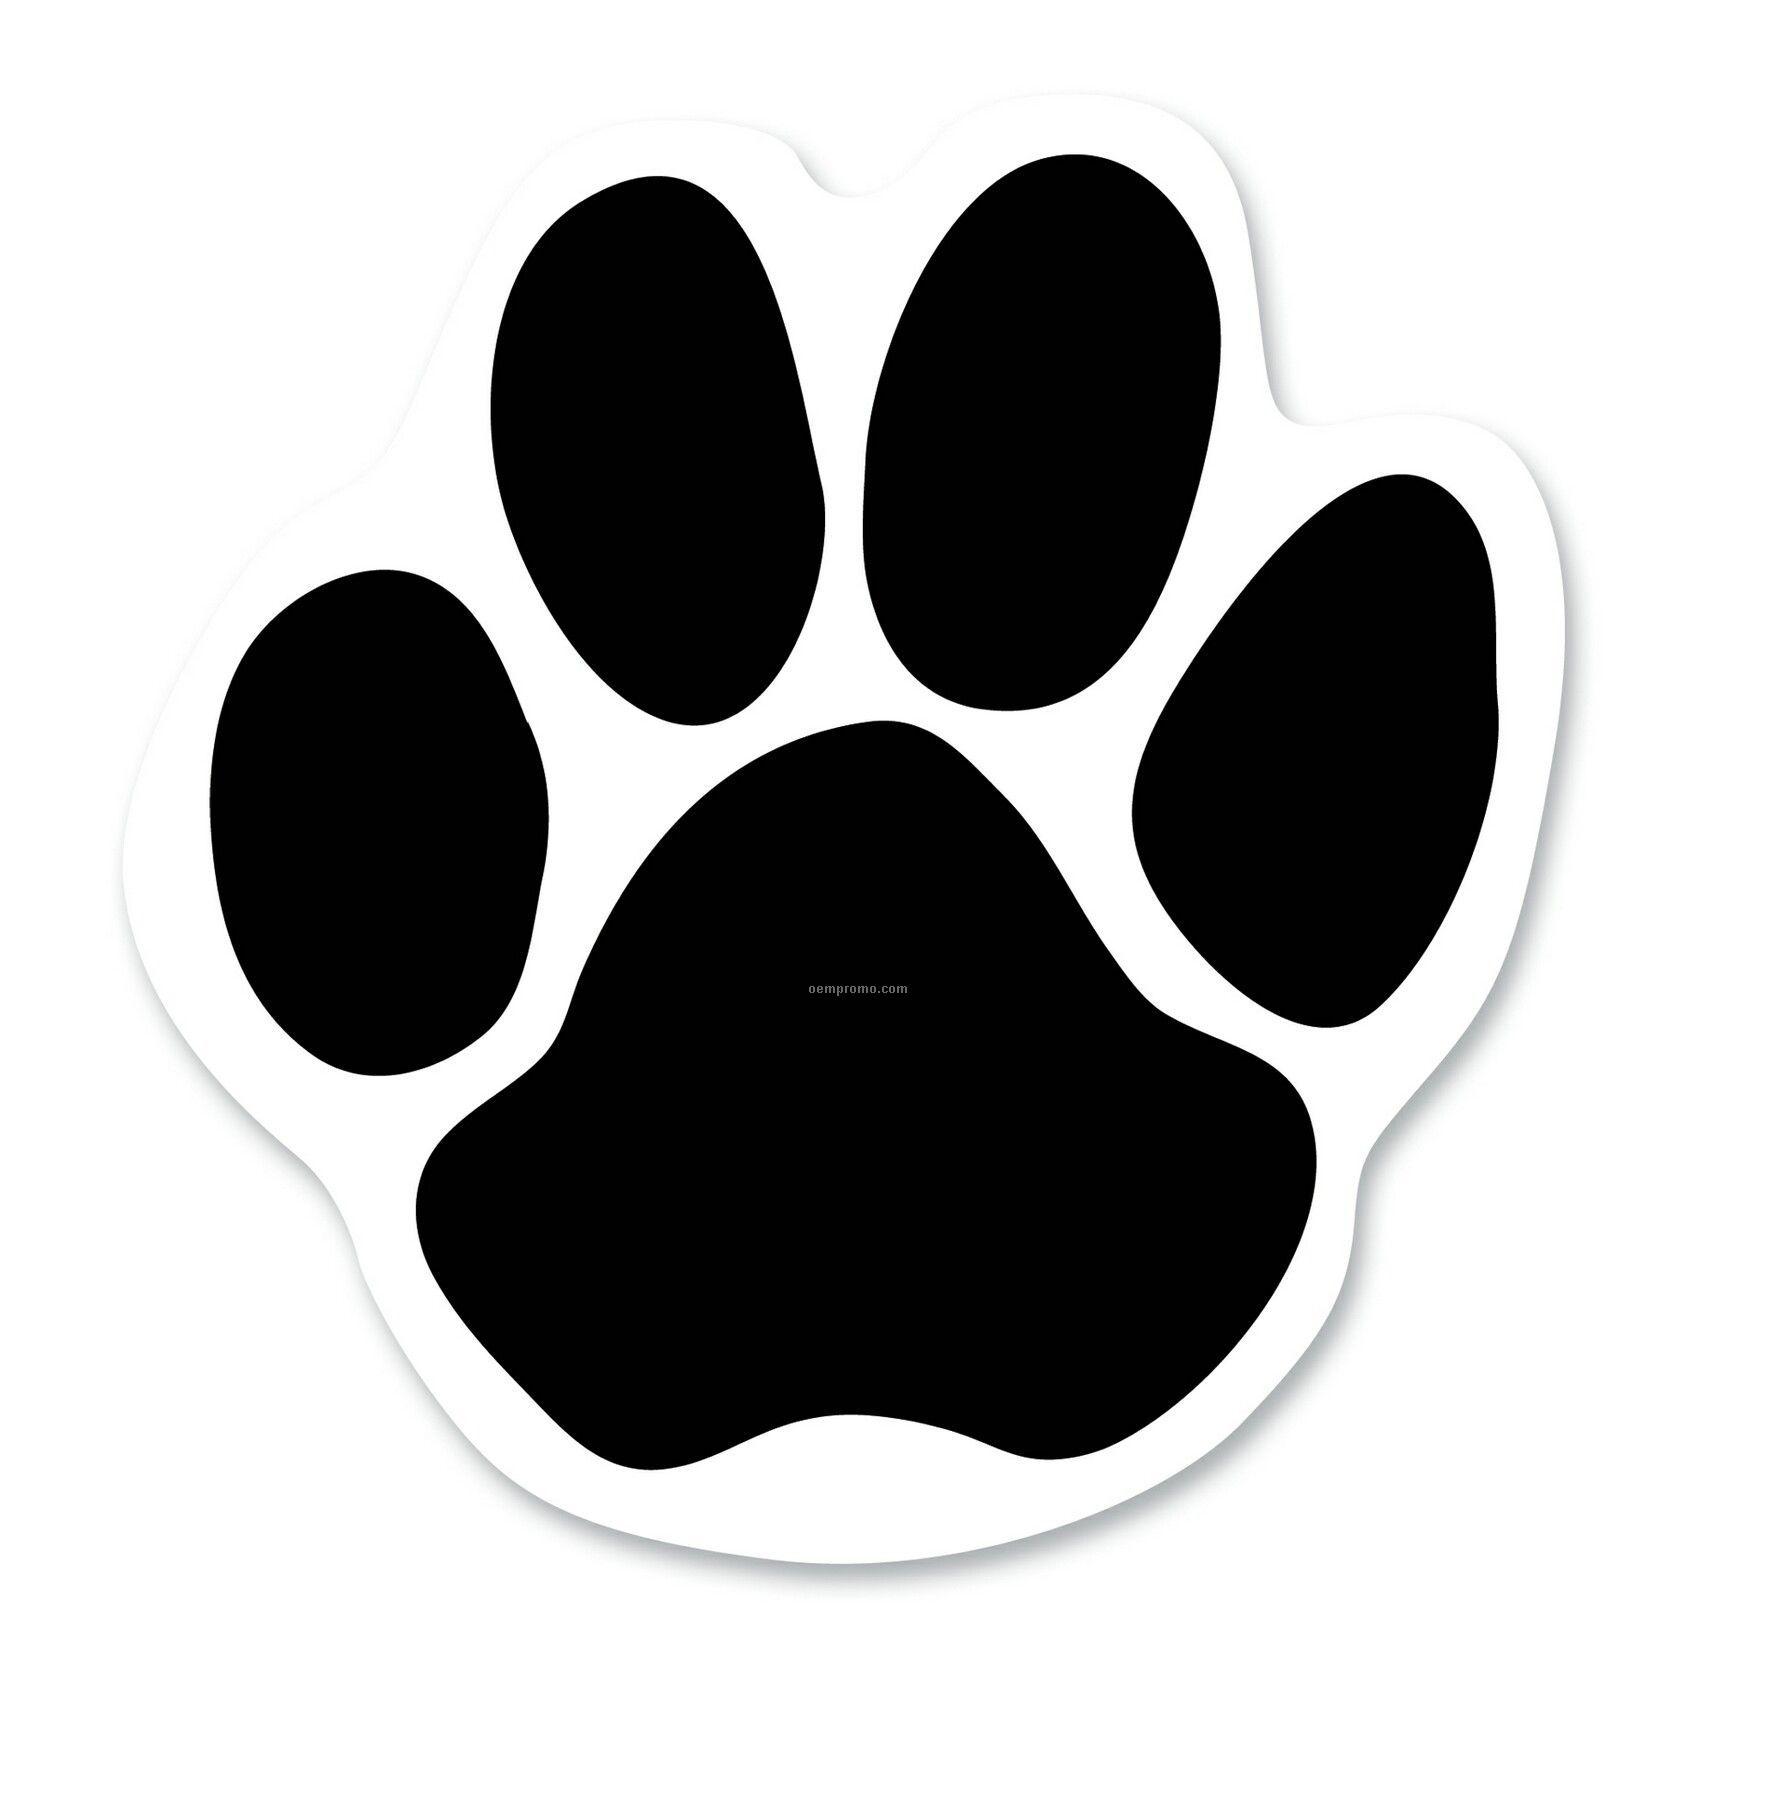 Bear paw print dog foot prints logo free download clip art on.